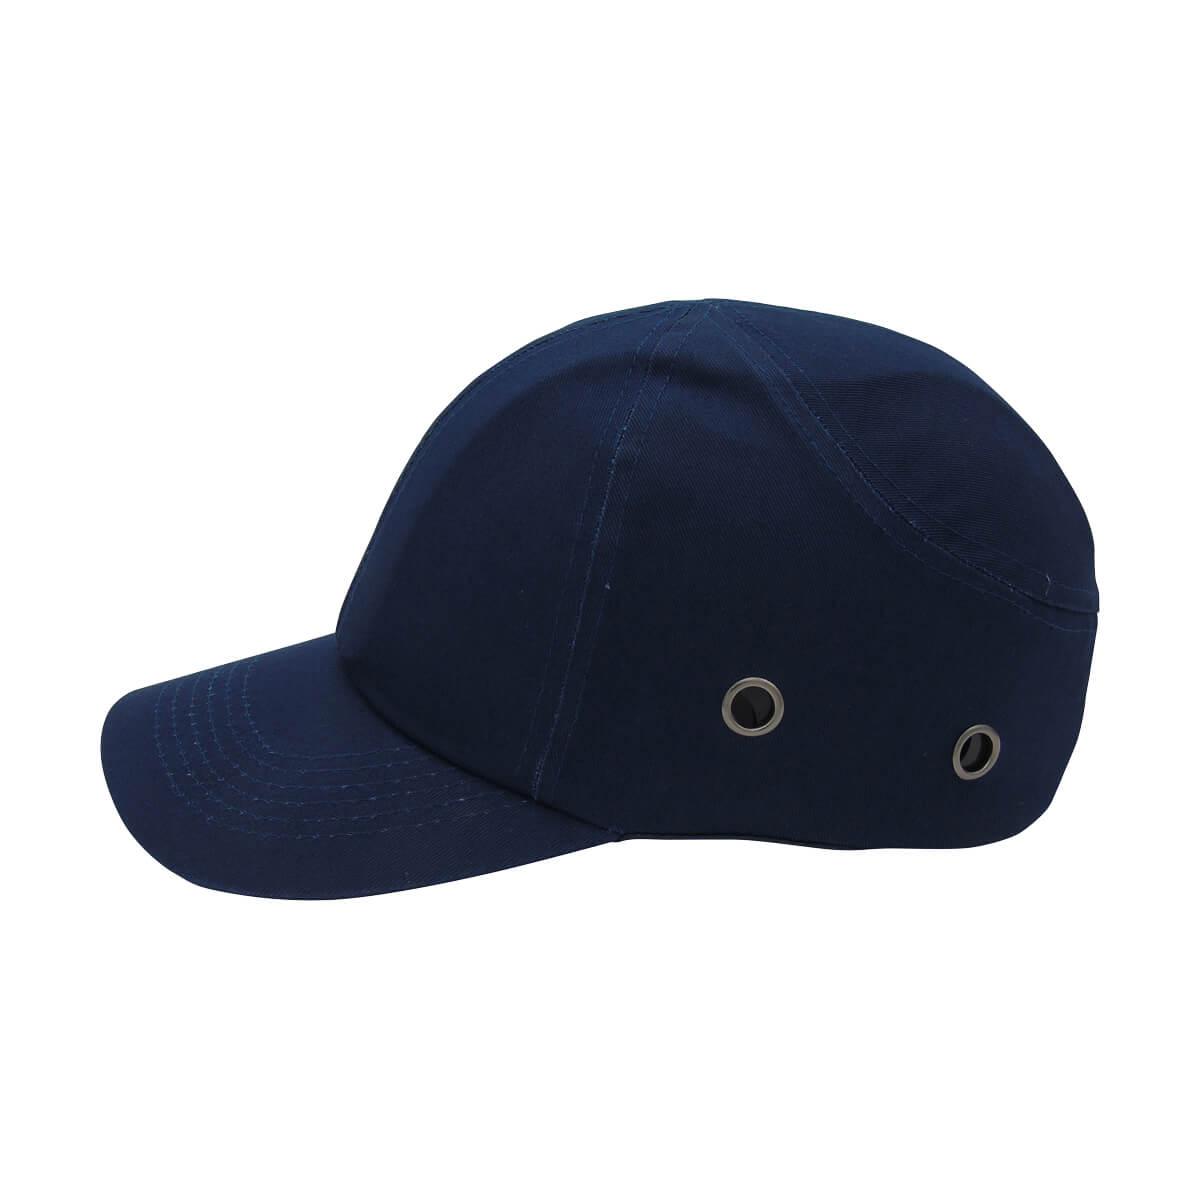 Baseball Cap-Style Bump Cap - Navy Blue